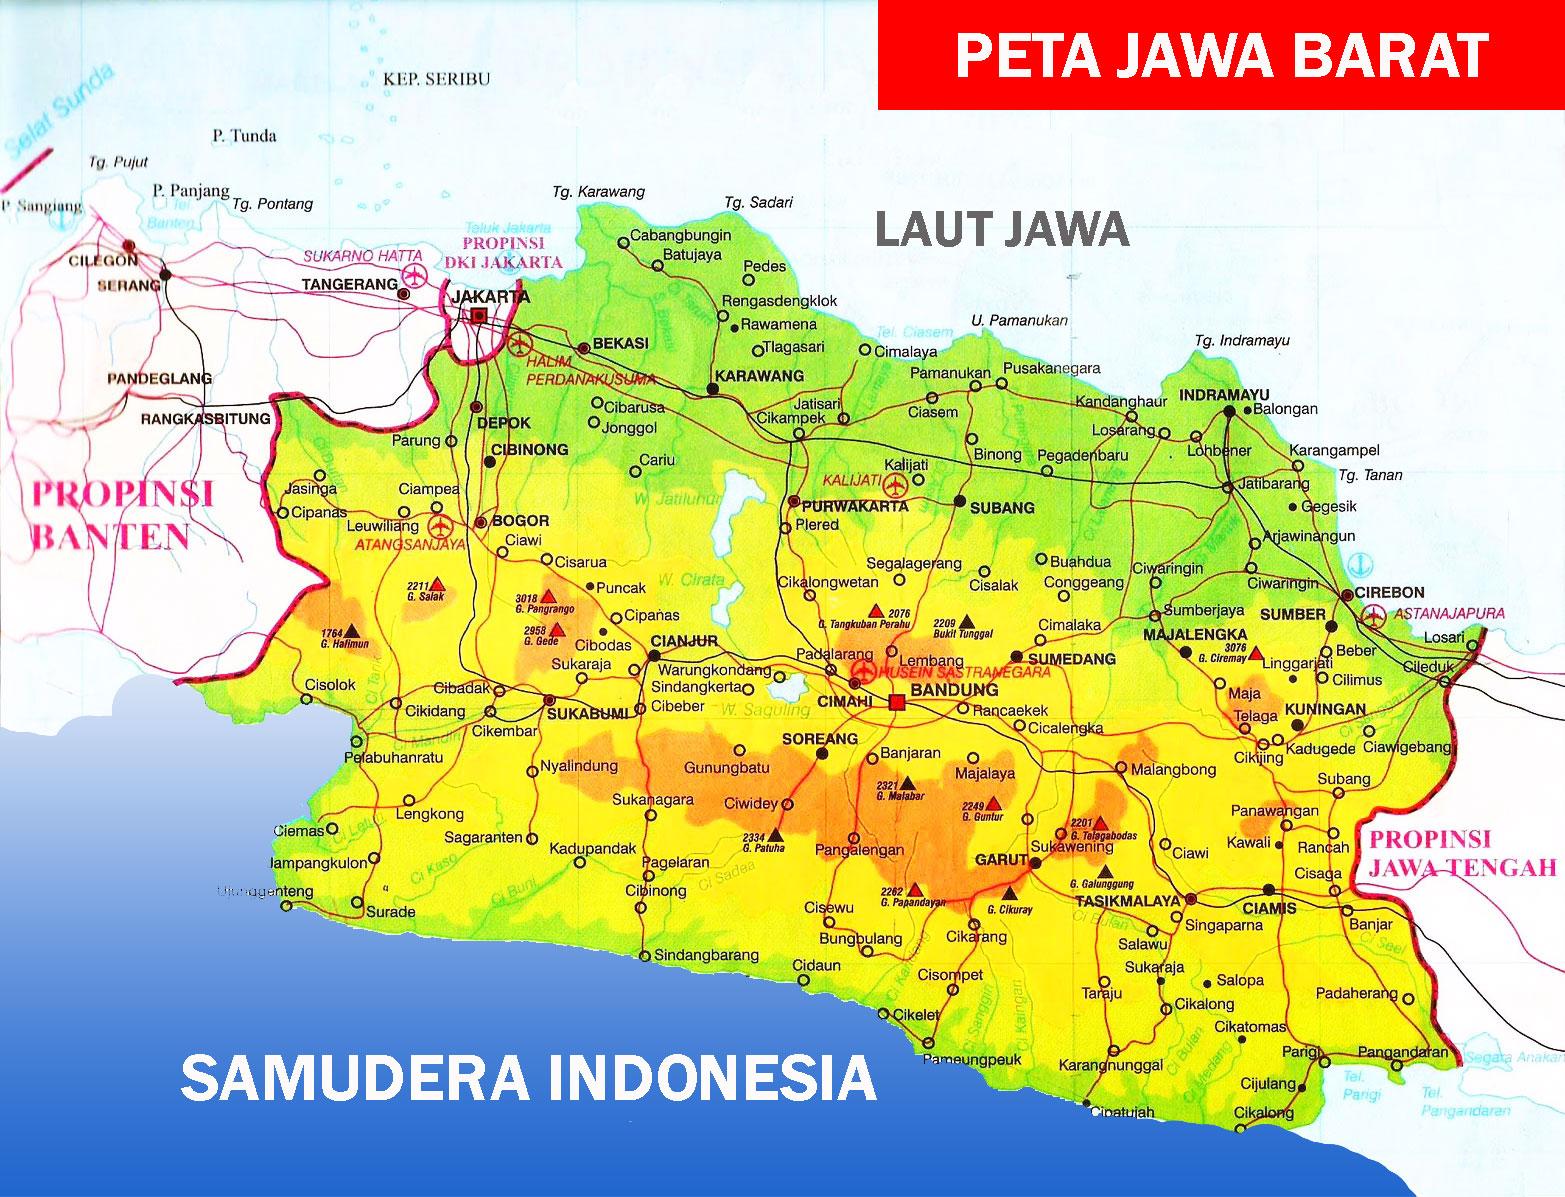 Peta-Jawa-Barat-versi-atlas